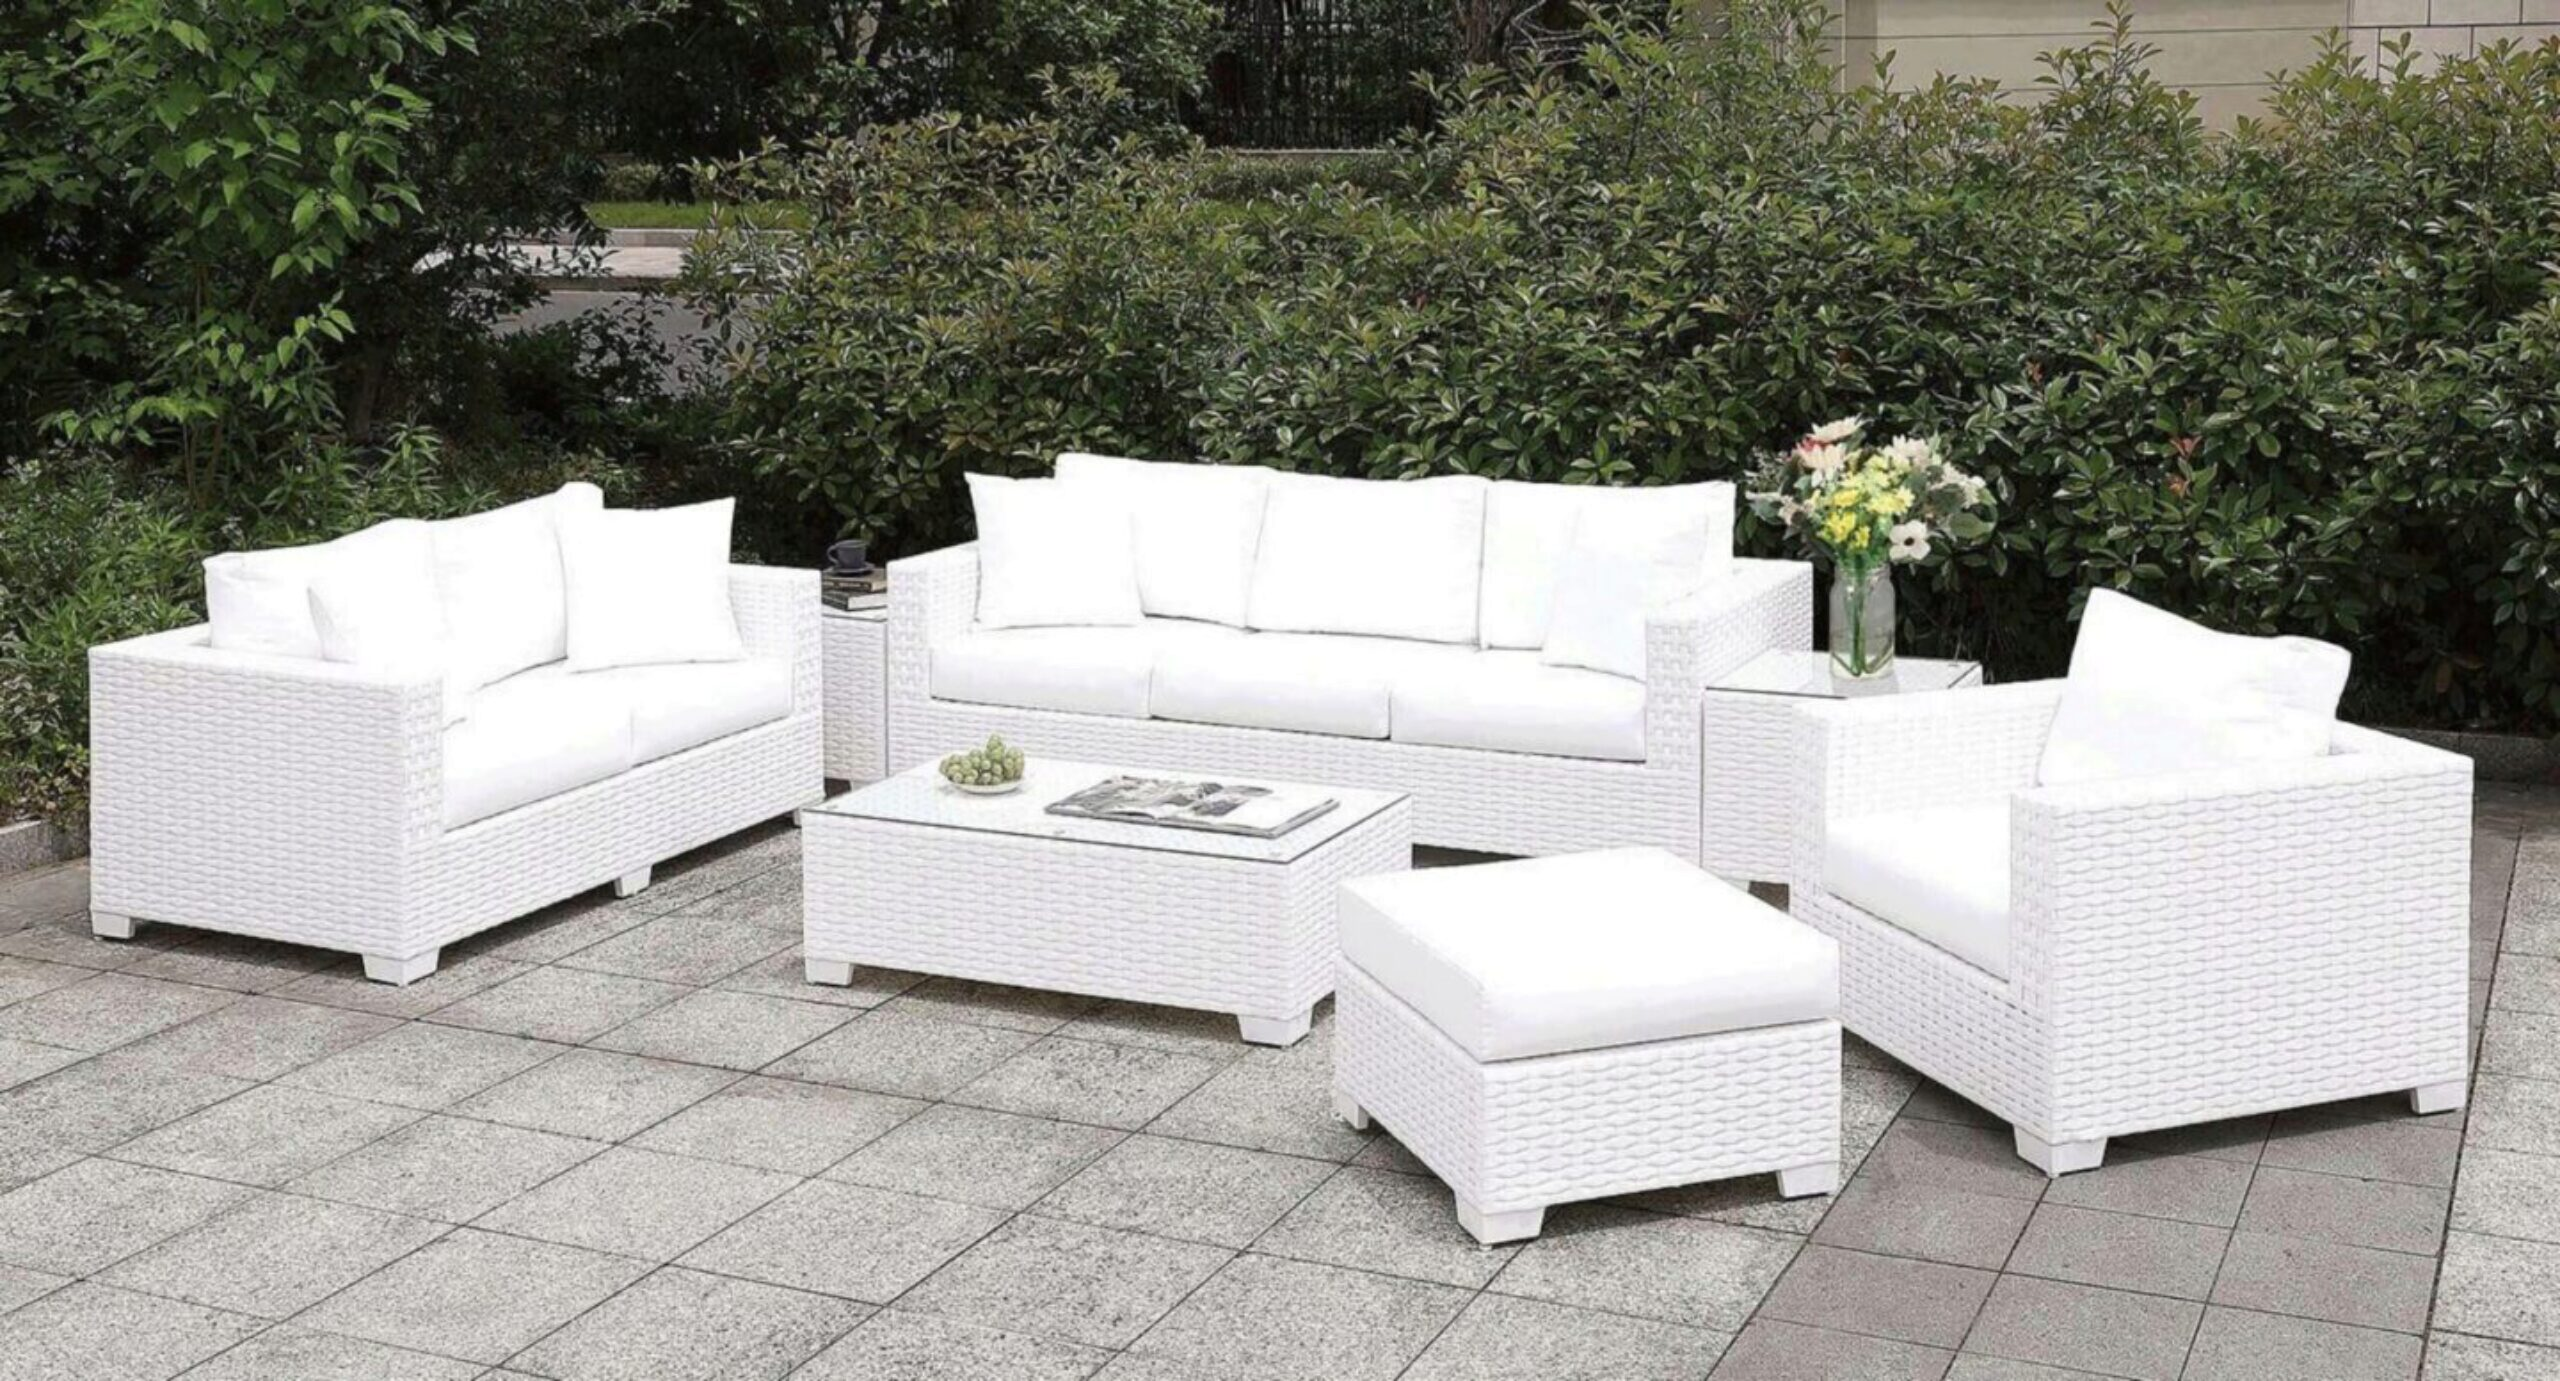 furniture of america somani ii white wicker patio sectional sofa 7 pcs set